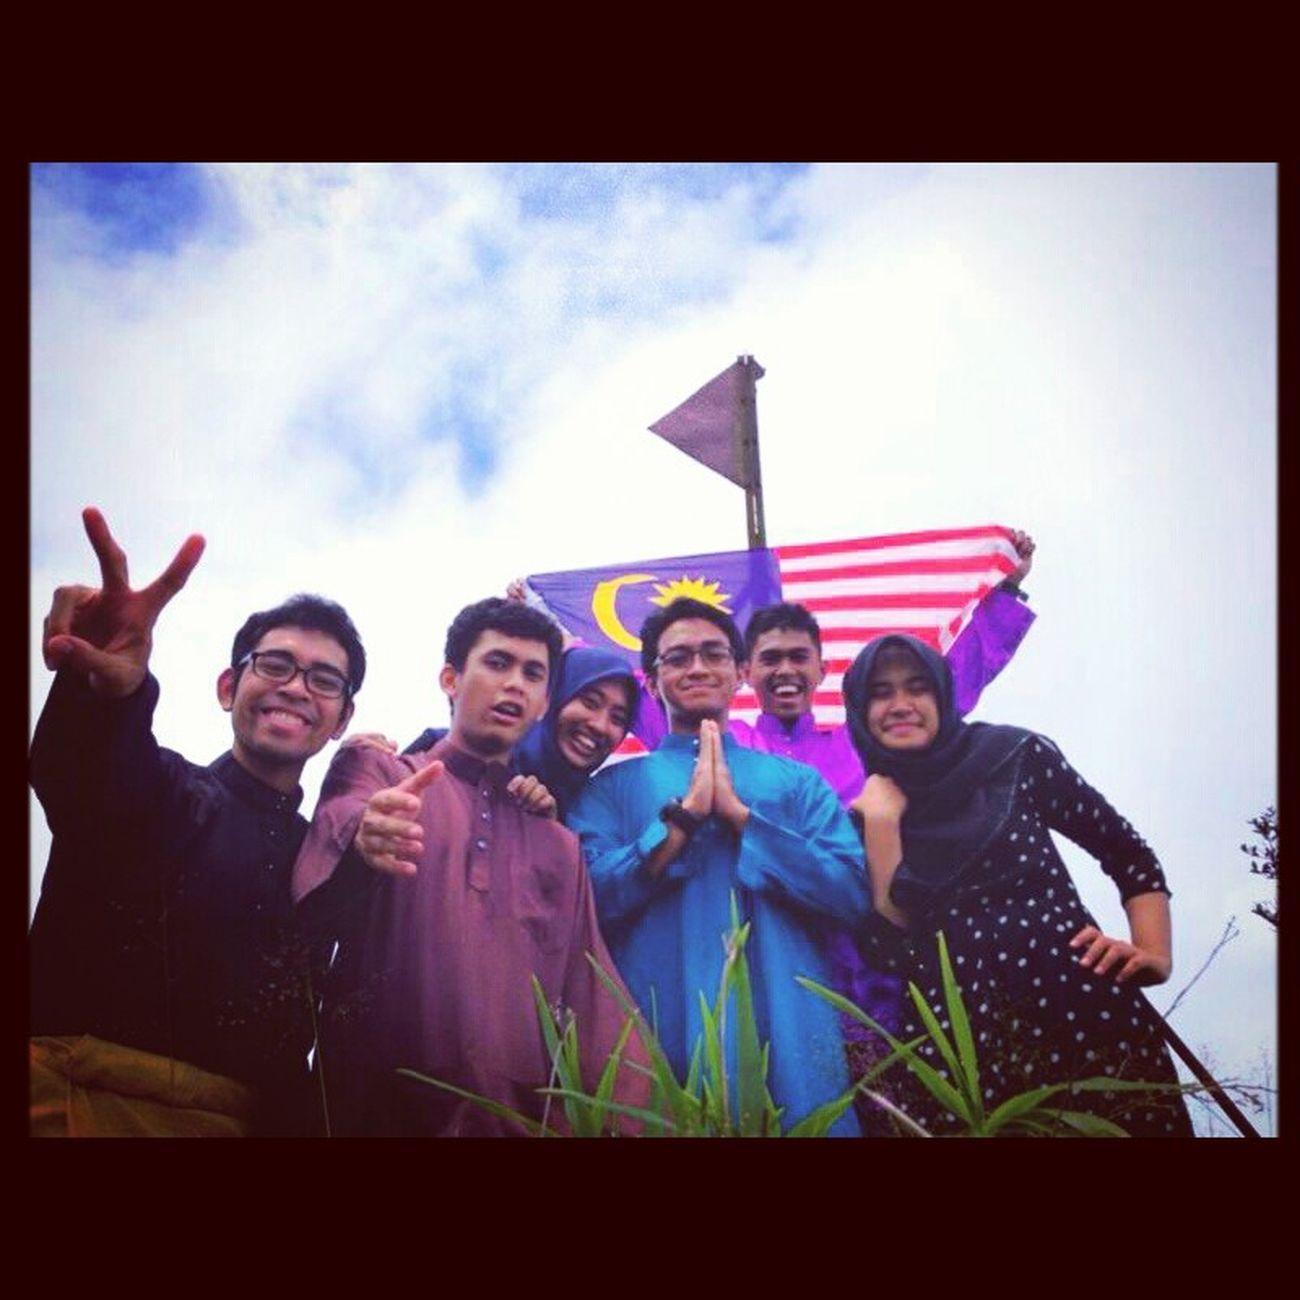 Merdeka Raya at Puncak Bah Gading with Team OGKL. Yolo KEMBARIANS Hike